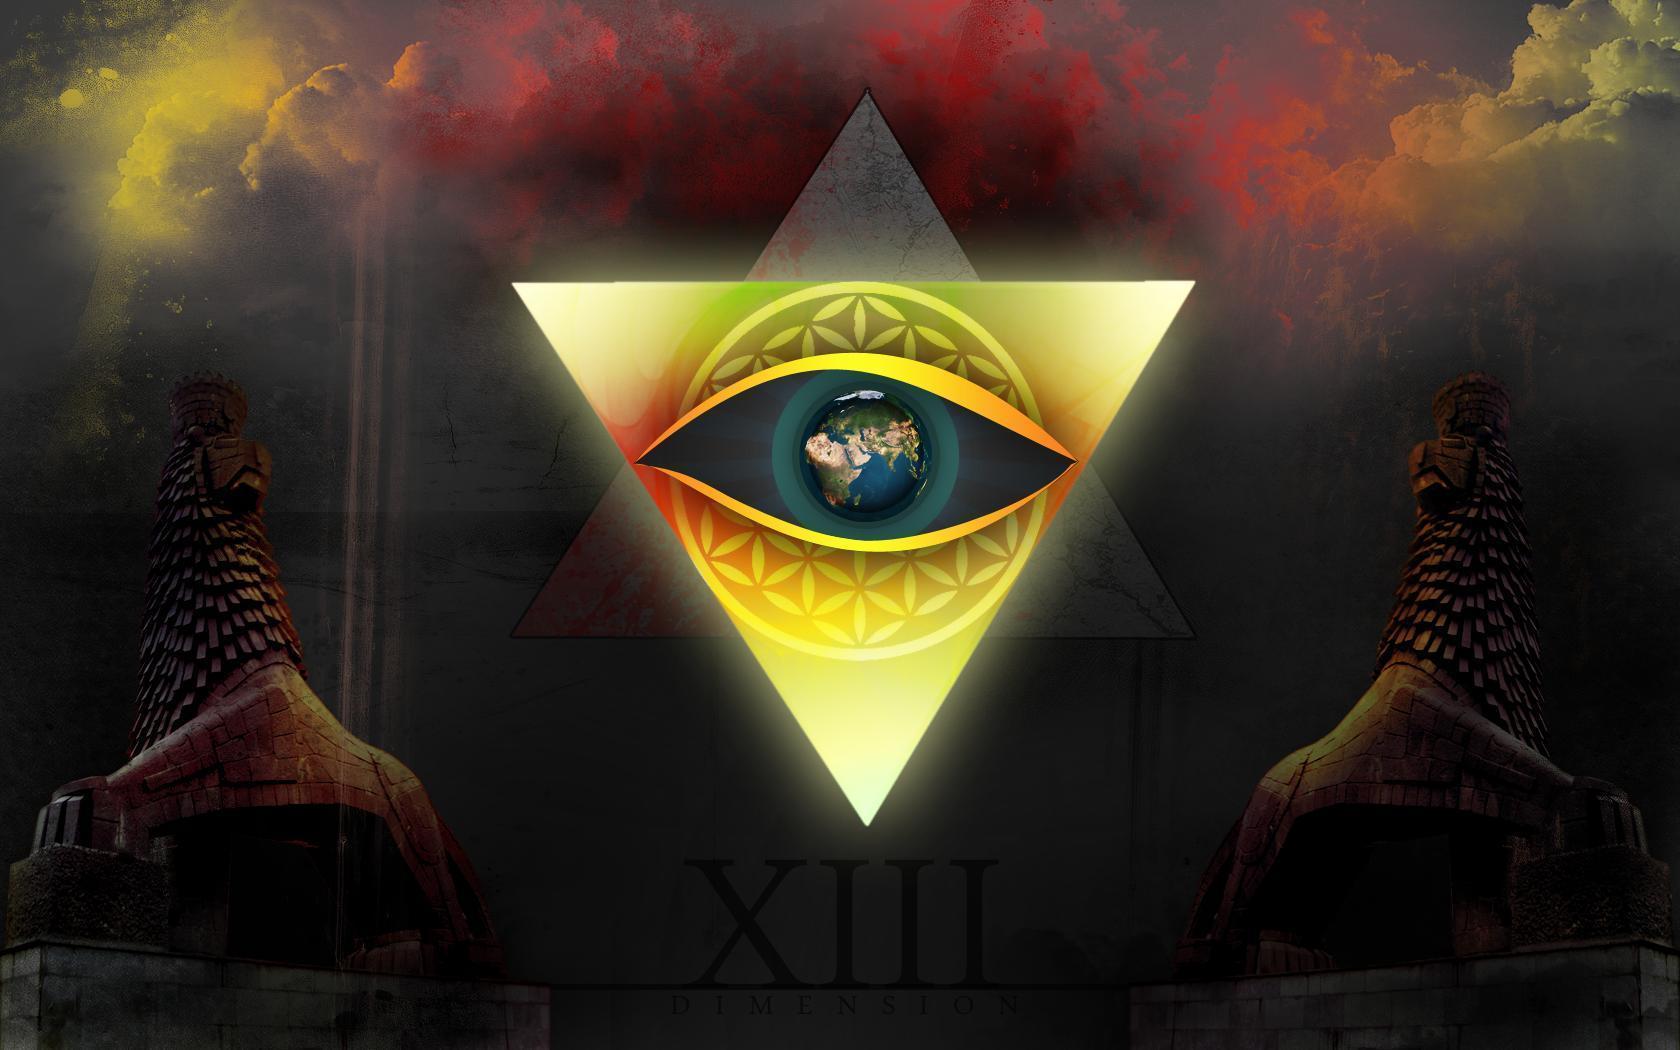 illuminati symbol wallpaper 1920x1080 - photo #11